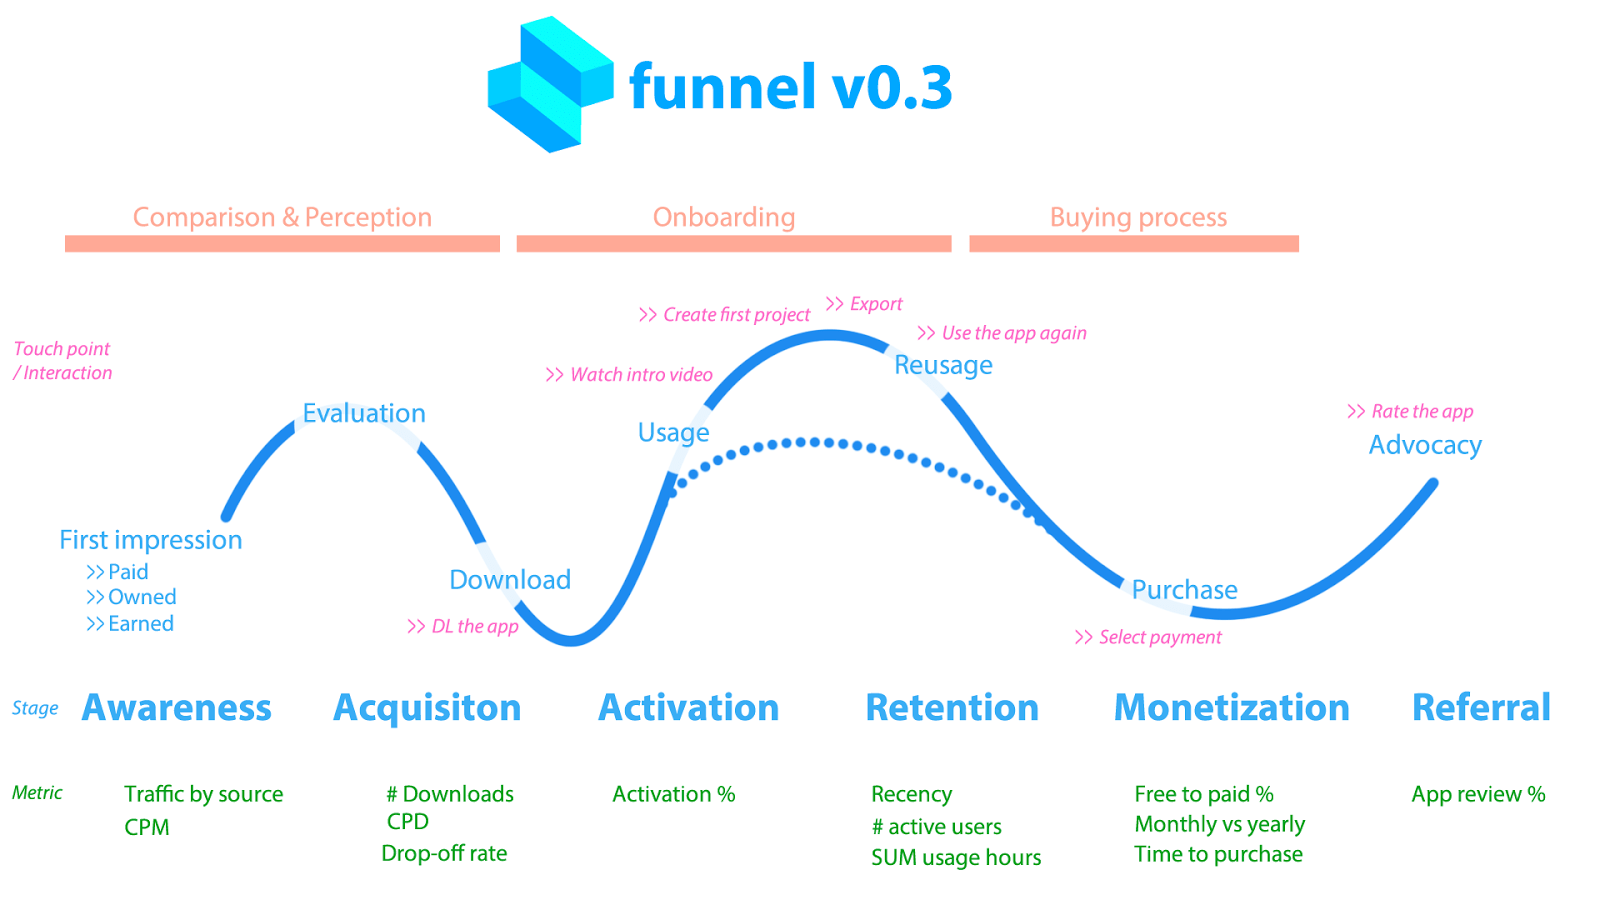 Visualizing the user journey